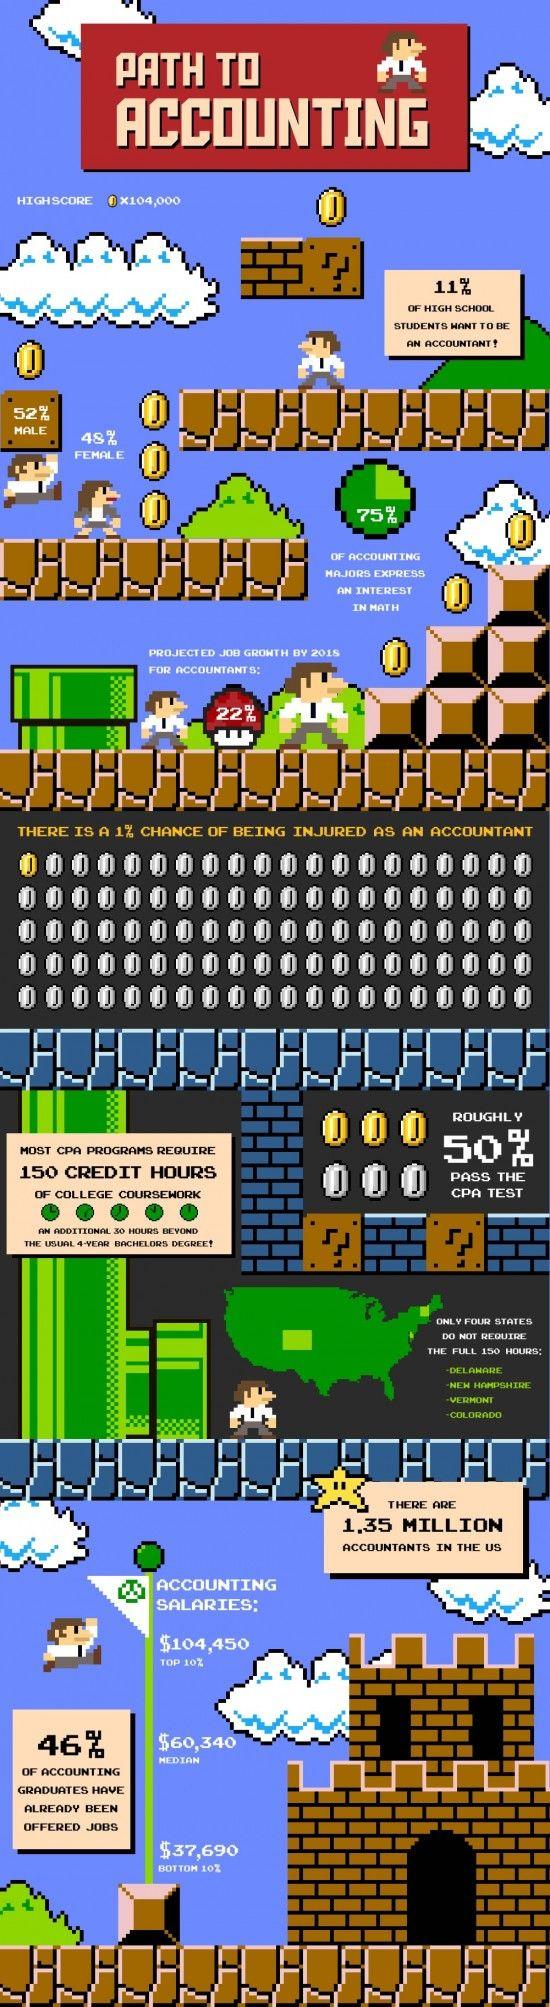 top ideas about accounting memes humor miami a fun infographic describing the path to become an accountant super mario bros style some